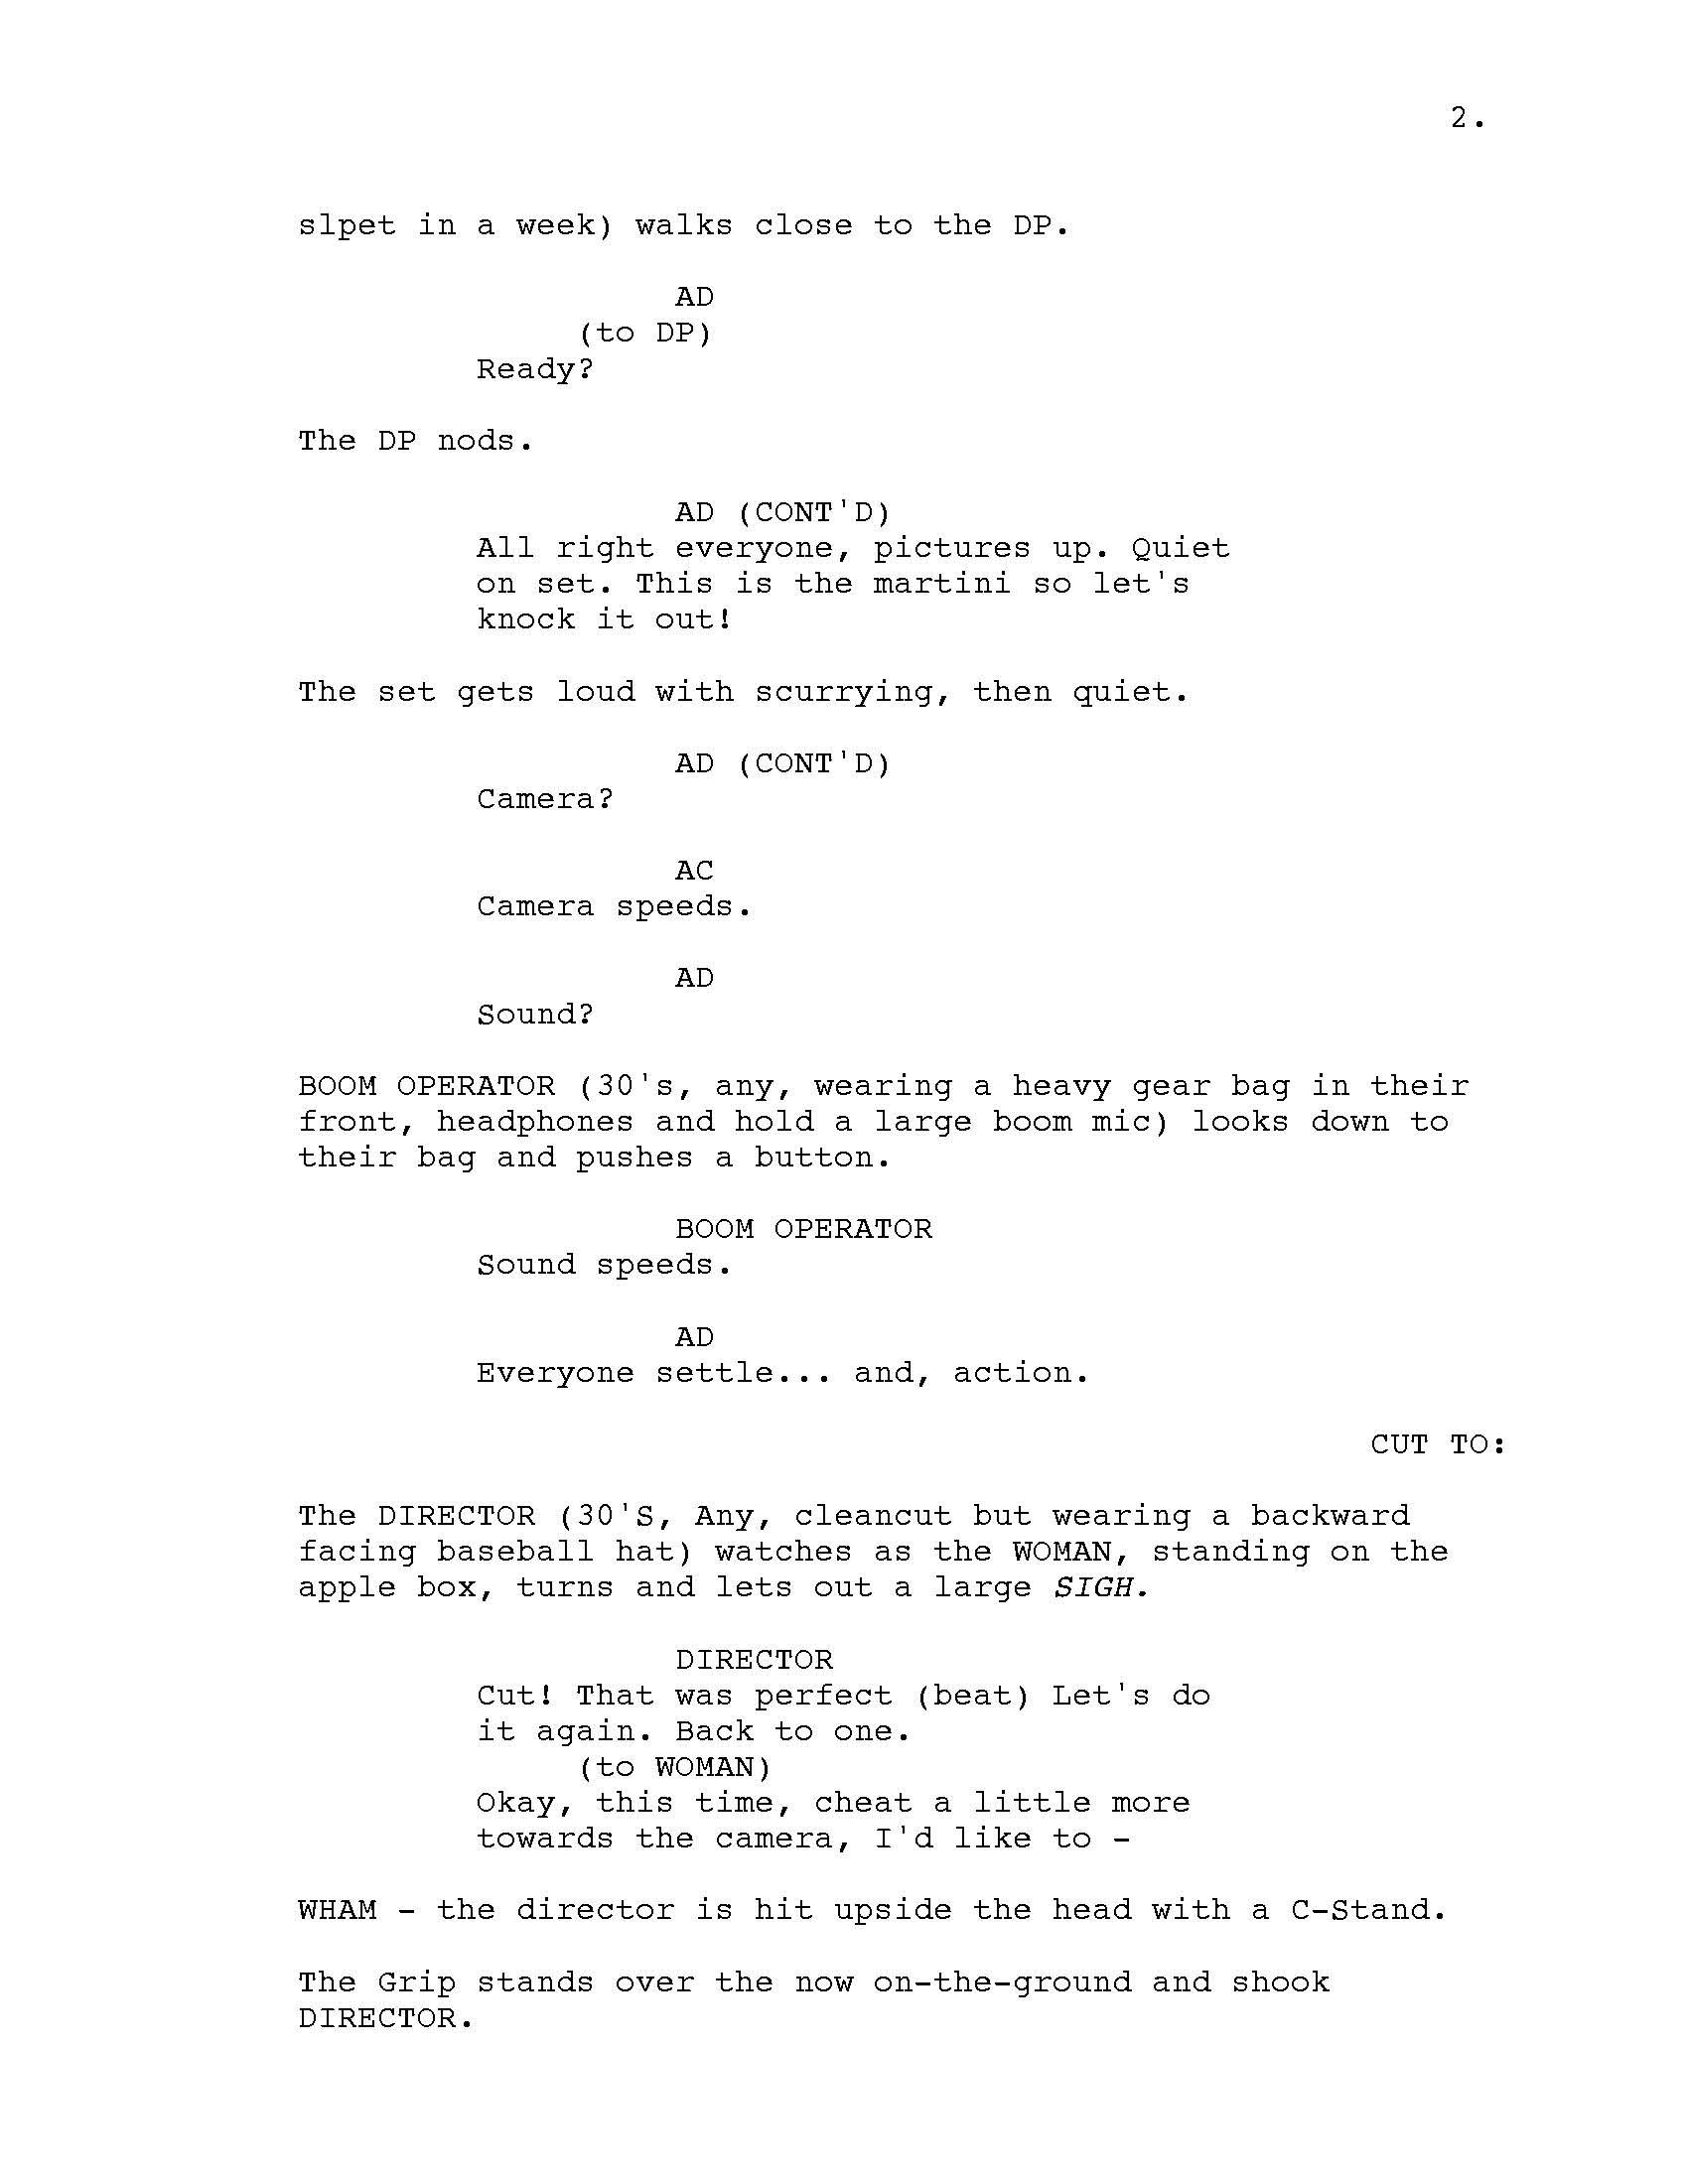 Script Film terms_Page_2.jpg